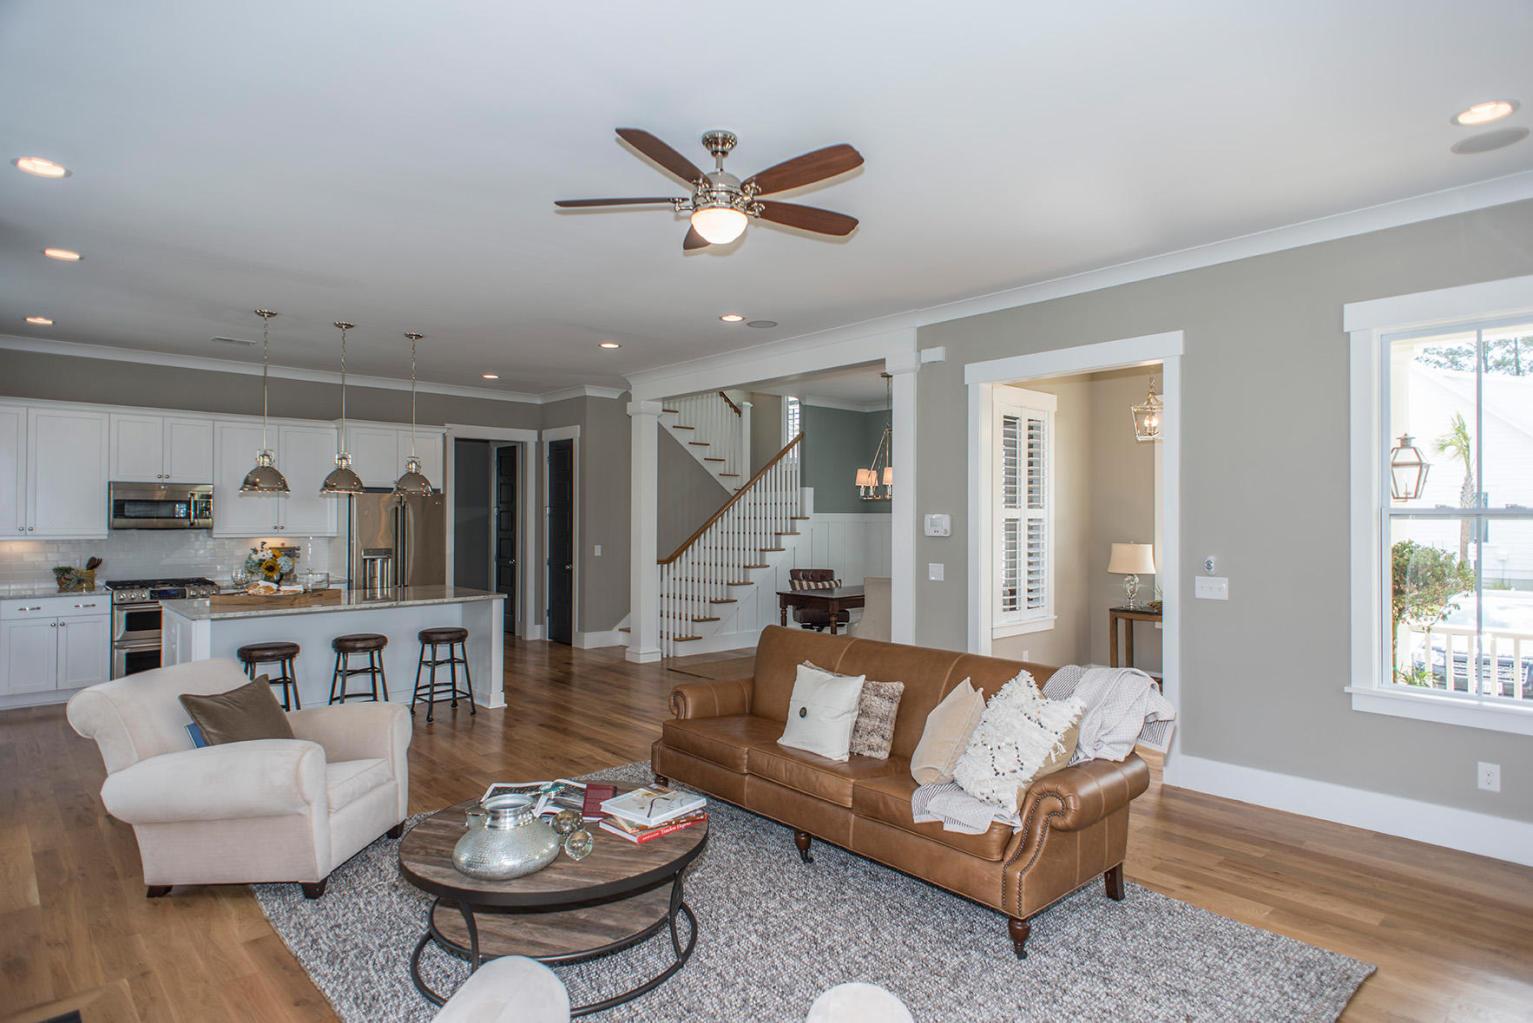 Carolina Park Homes For Sale - 1534 Banning, Mount Pleasant, SC - 16